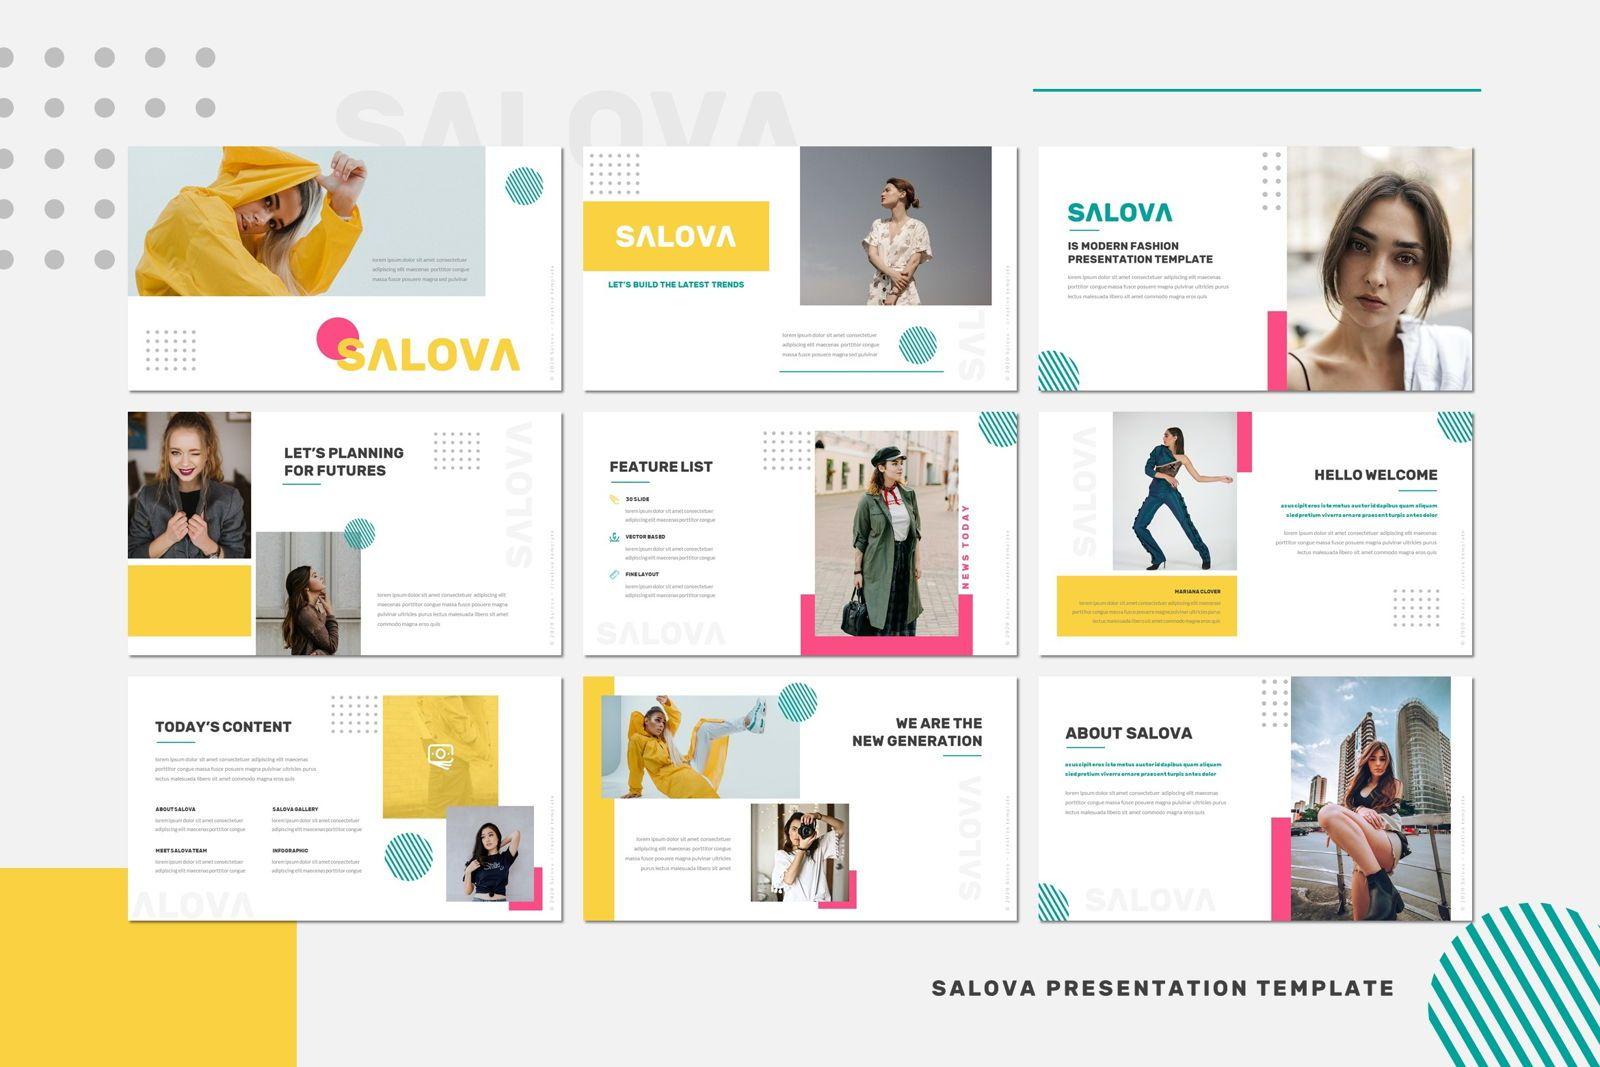 Salova - Google Slides Template, Slide 2, 07981, Presentation Templates — PoweredTemplate.com